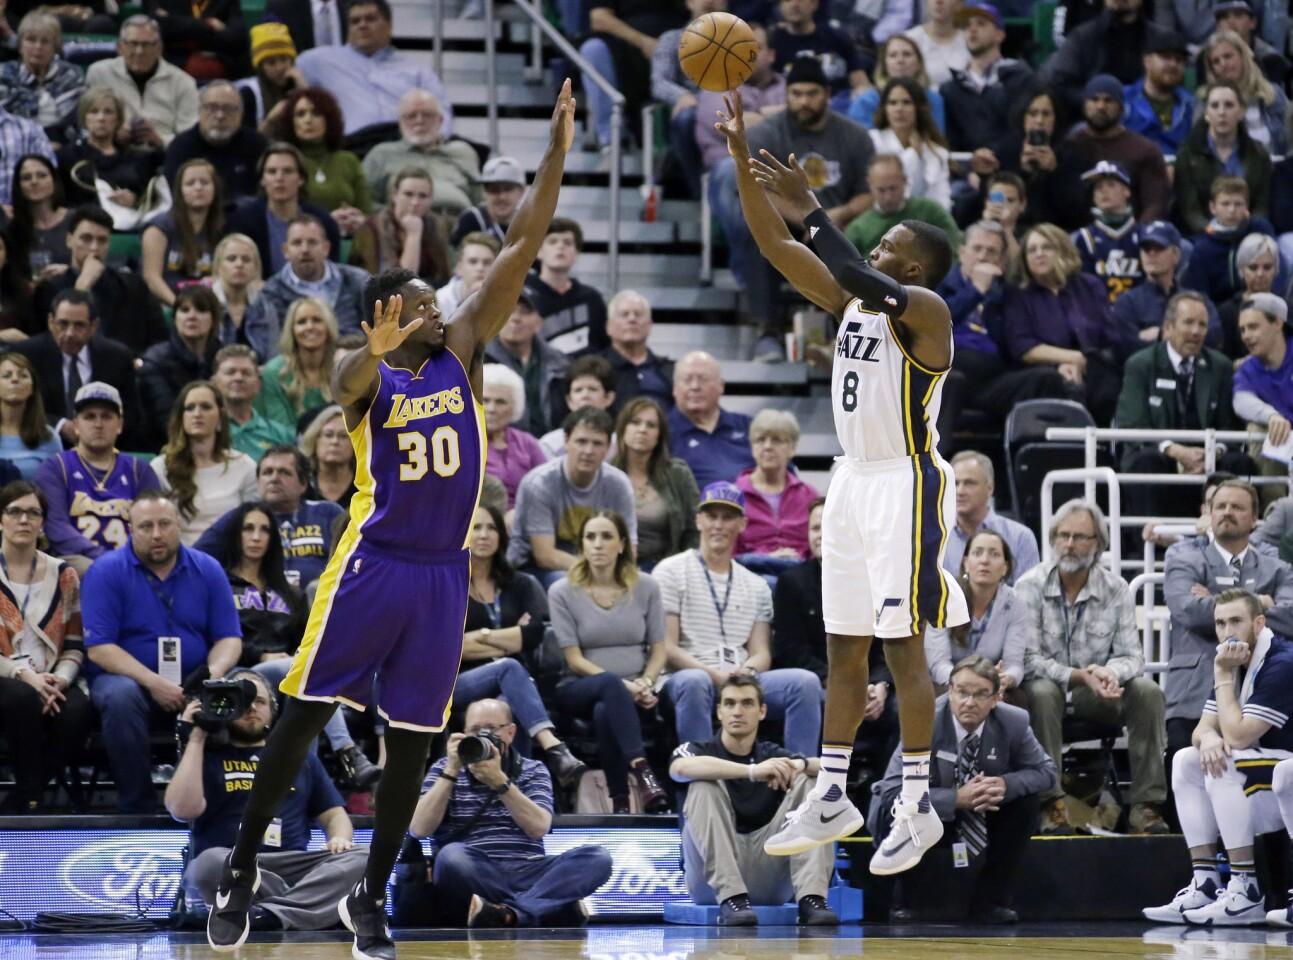 Utah Jazz guard Shelvin Mack (8) shoots over Lakers forward Julius Randle (30) during the second quarter.